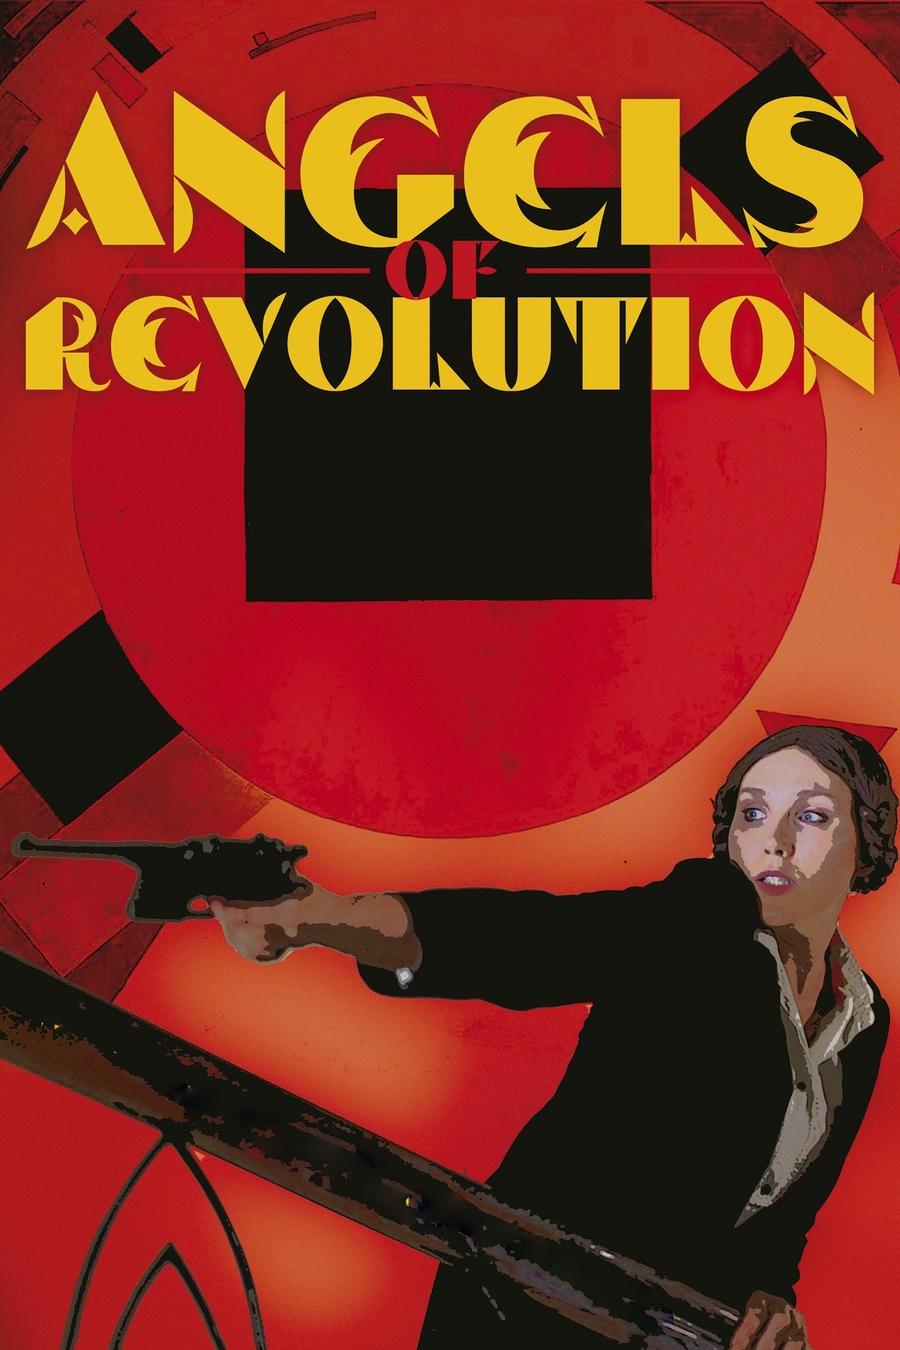 Angels of Revolution